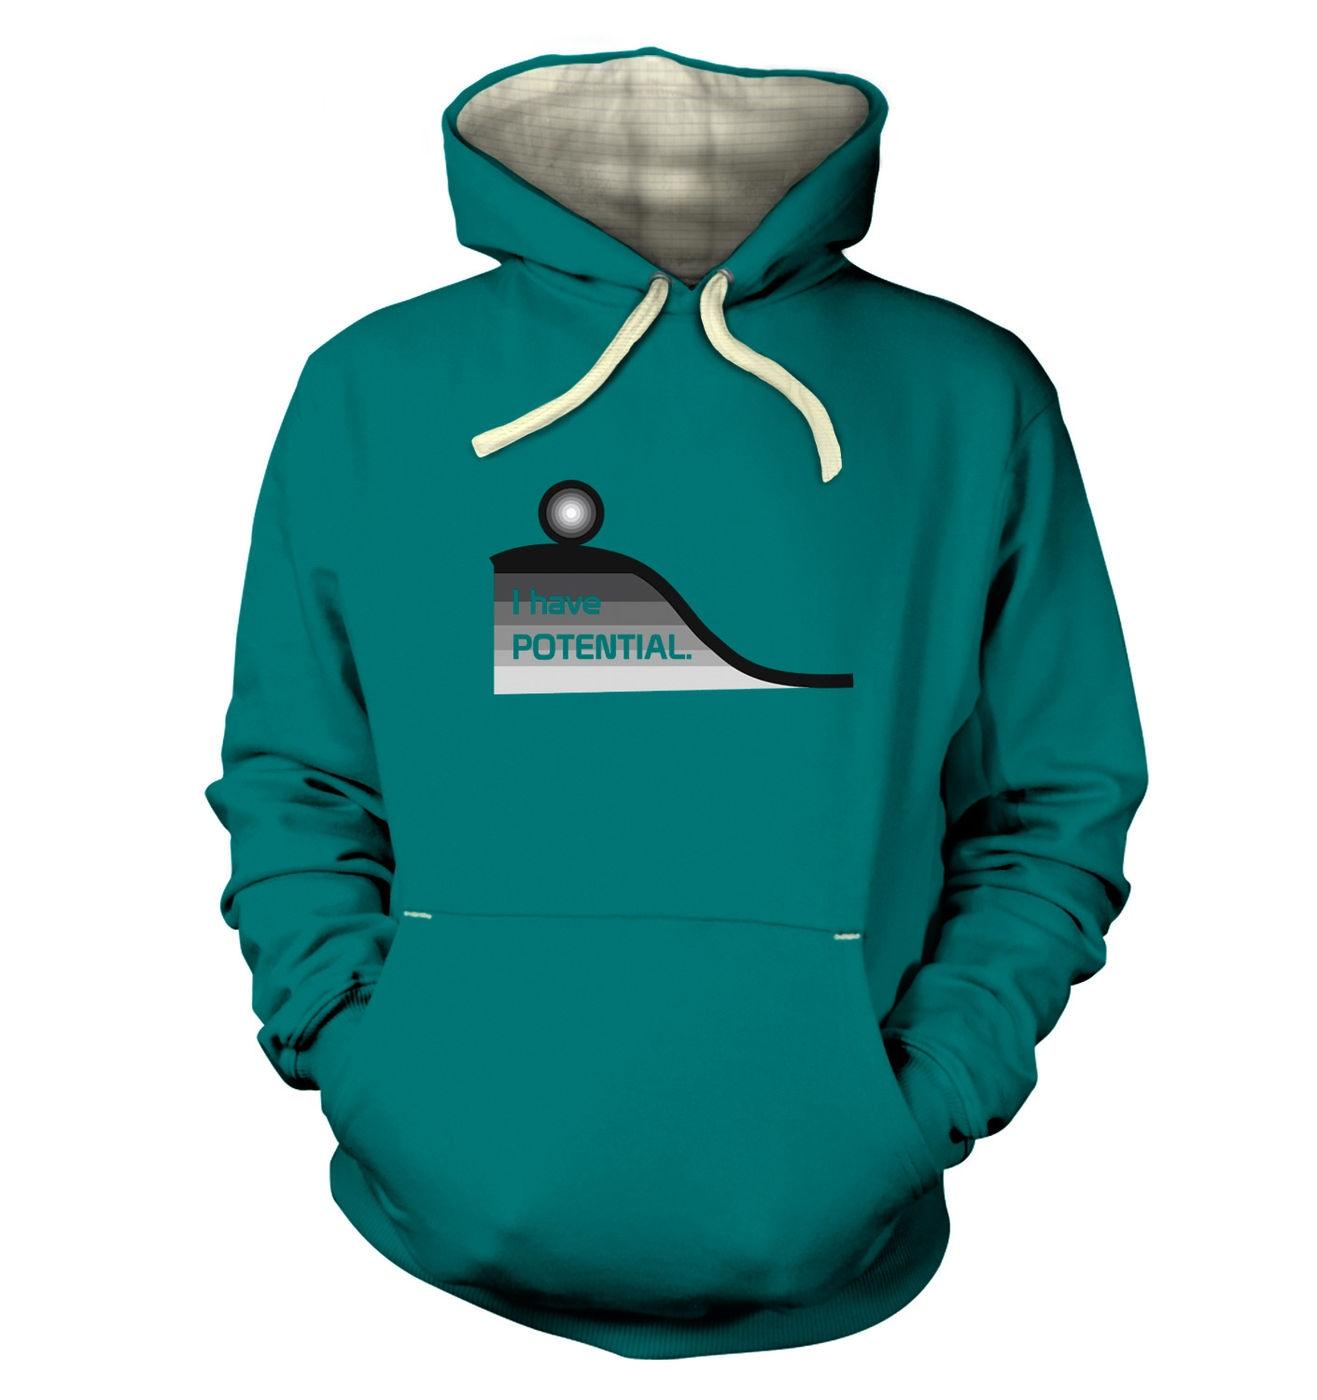 I Have Potential geeky science slogan premium hoodies